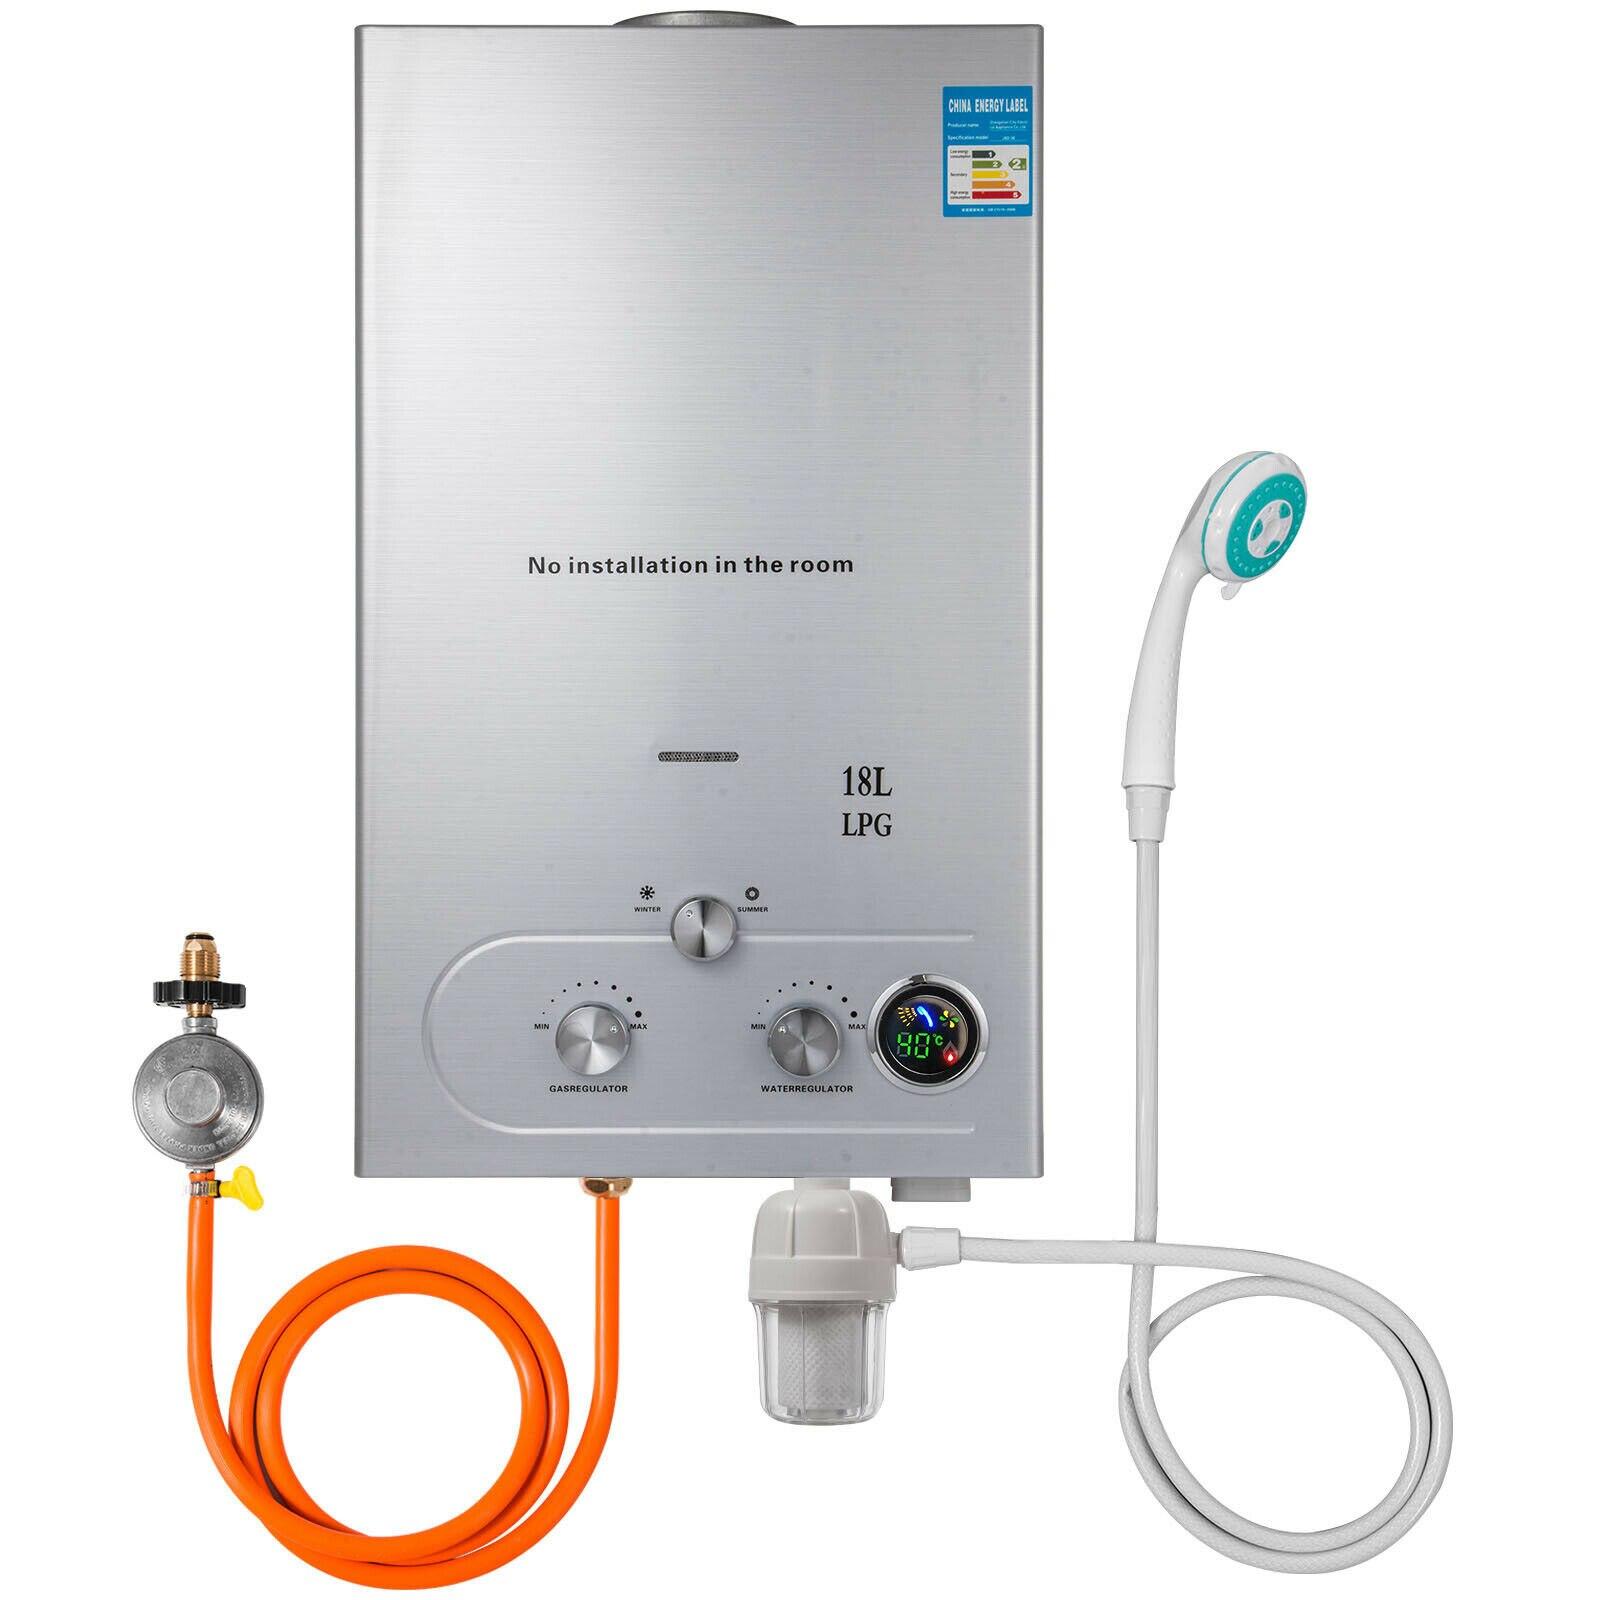 18L Hot Water Tank Instantaneous Water Heater Propane Water Filter Gas Regulator